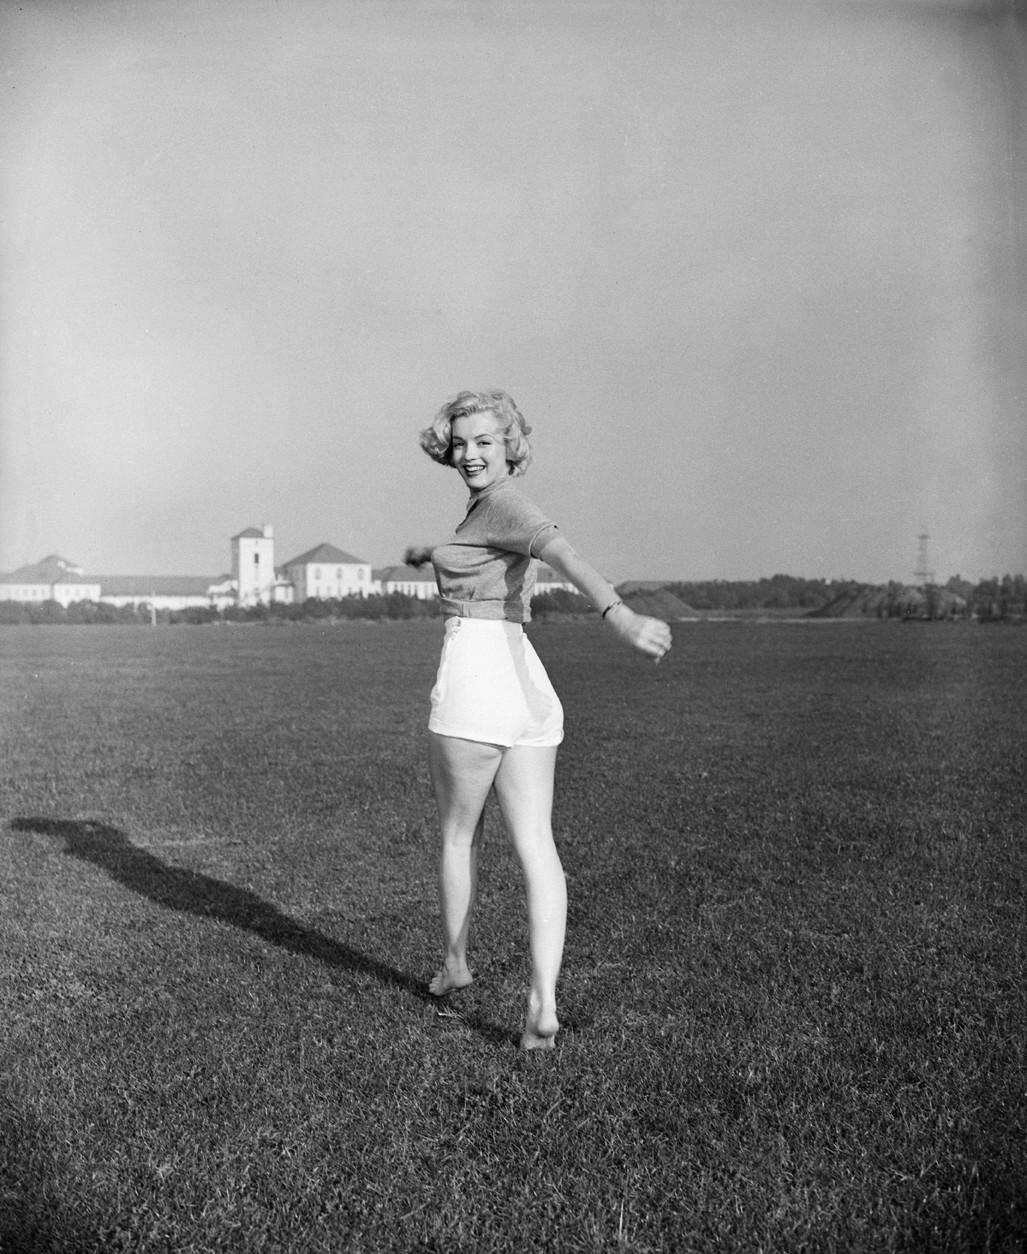 Marilyn Monroe In Twisting Pose On Feet